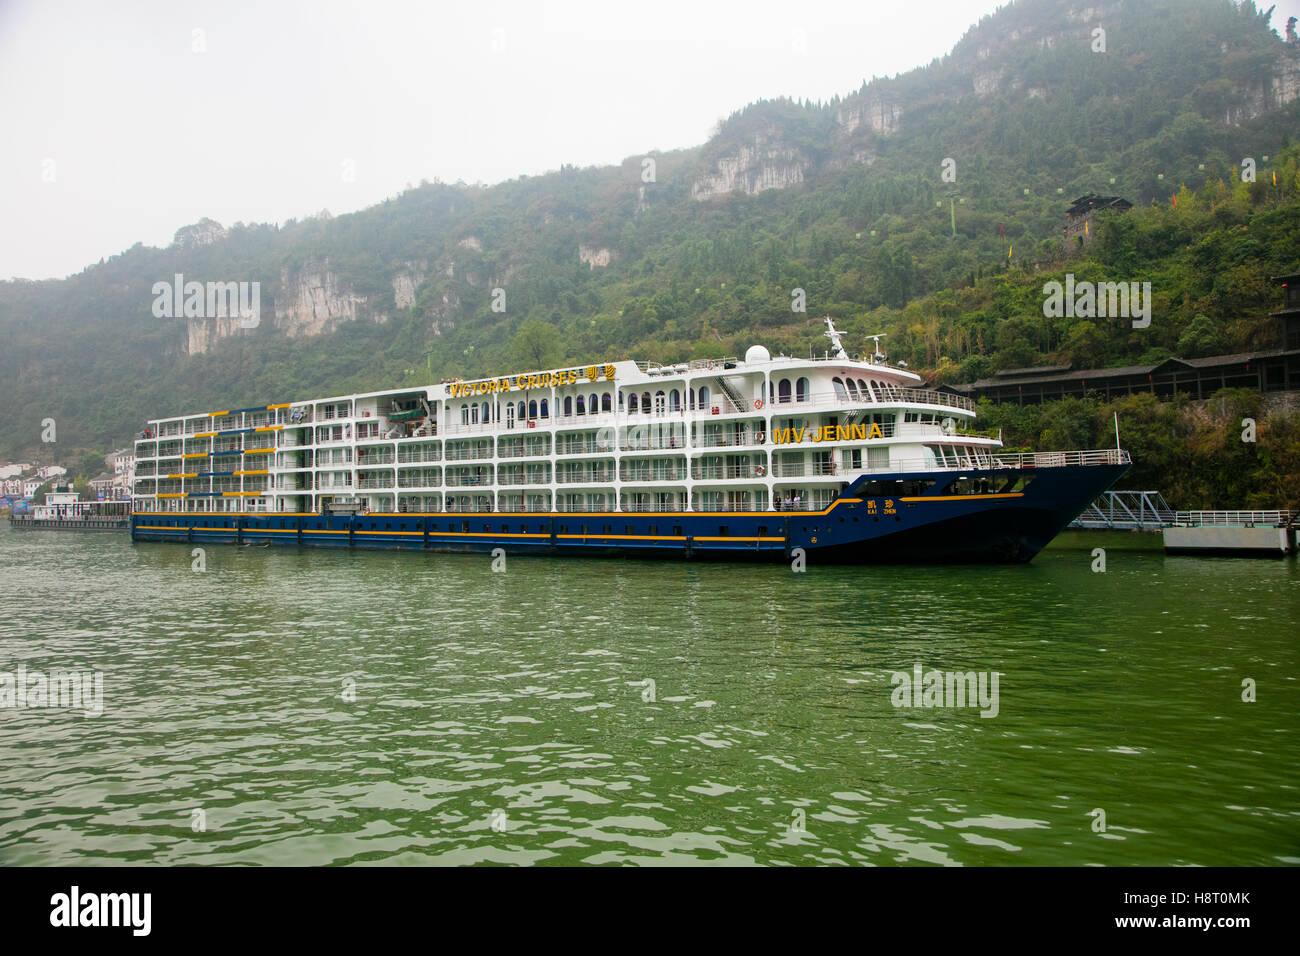 Victoria Cruises Yangtze River China Stock Photo Royalty Free - Victoria cruises